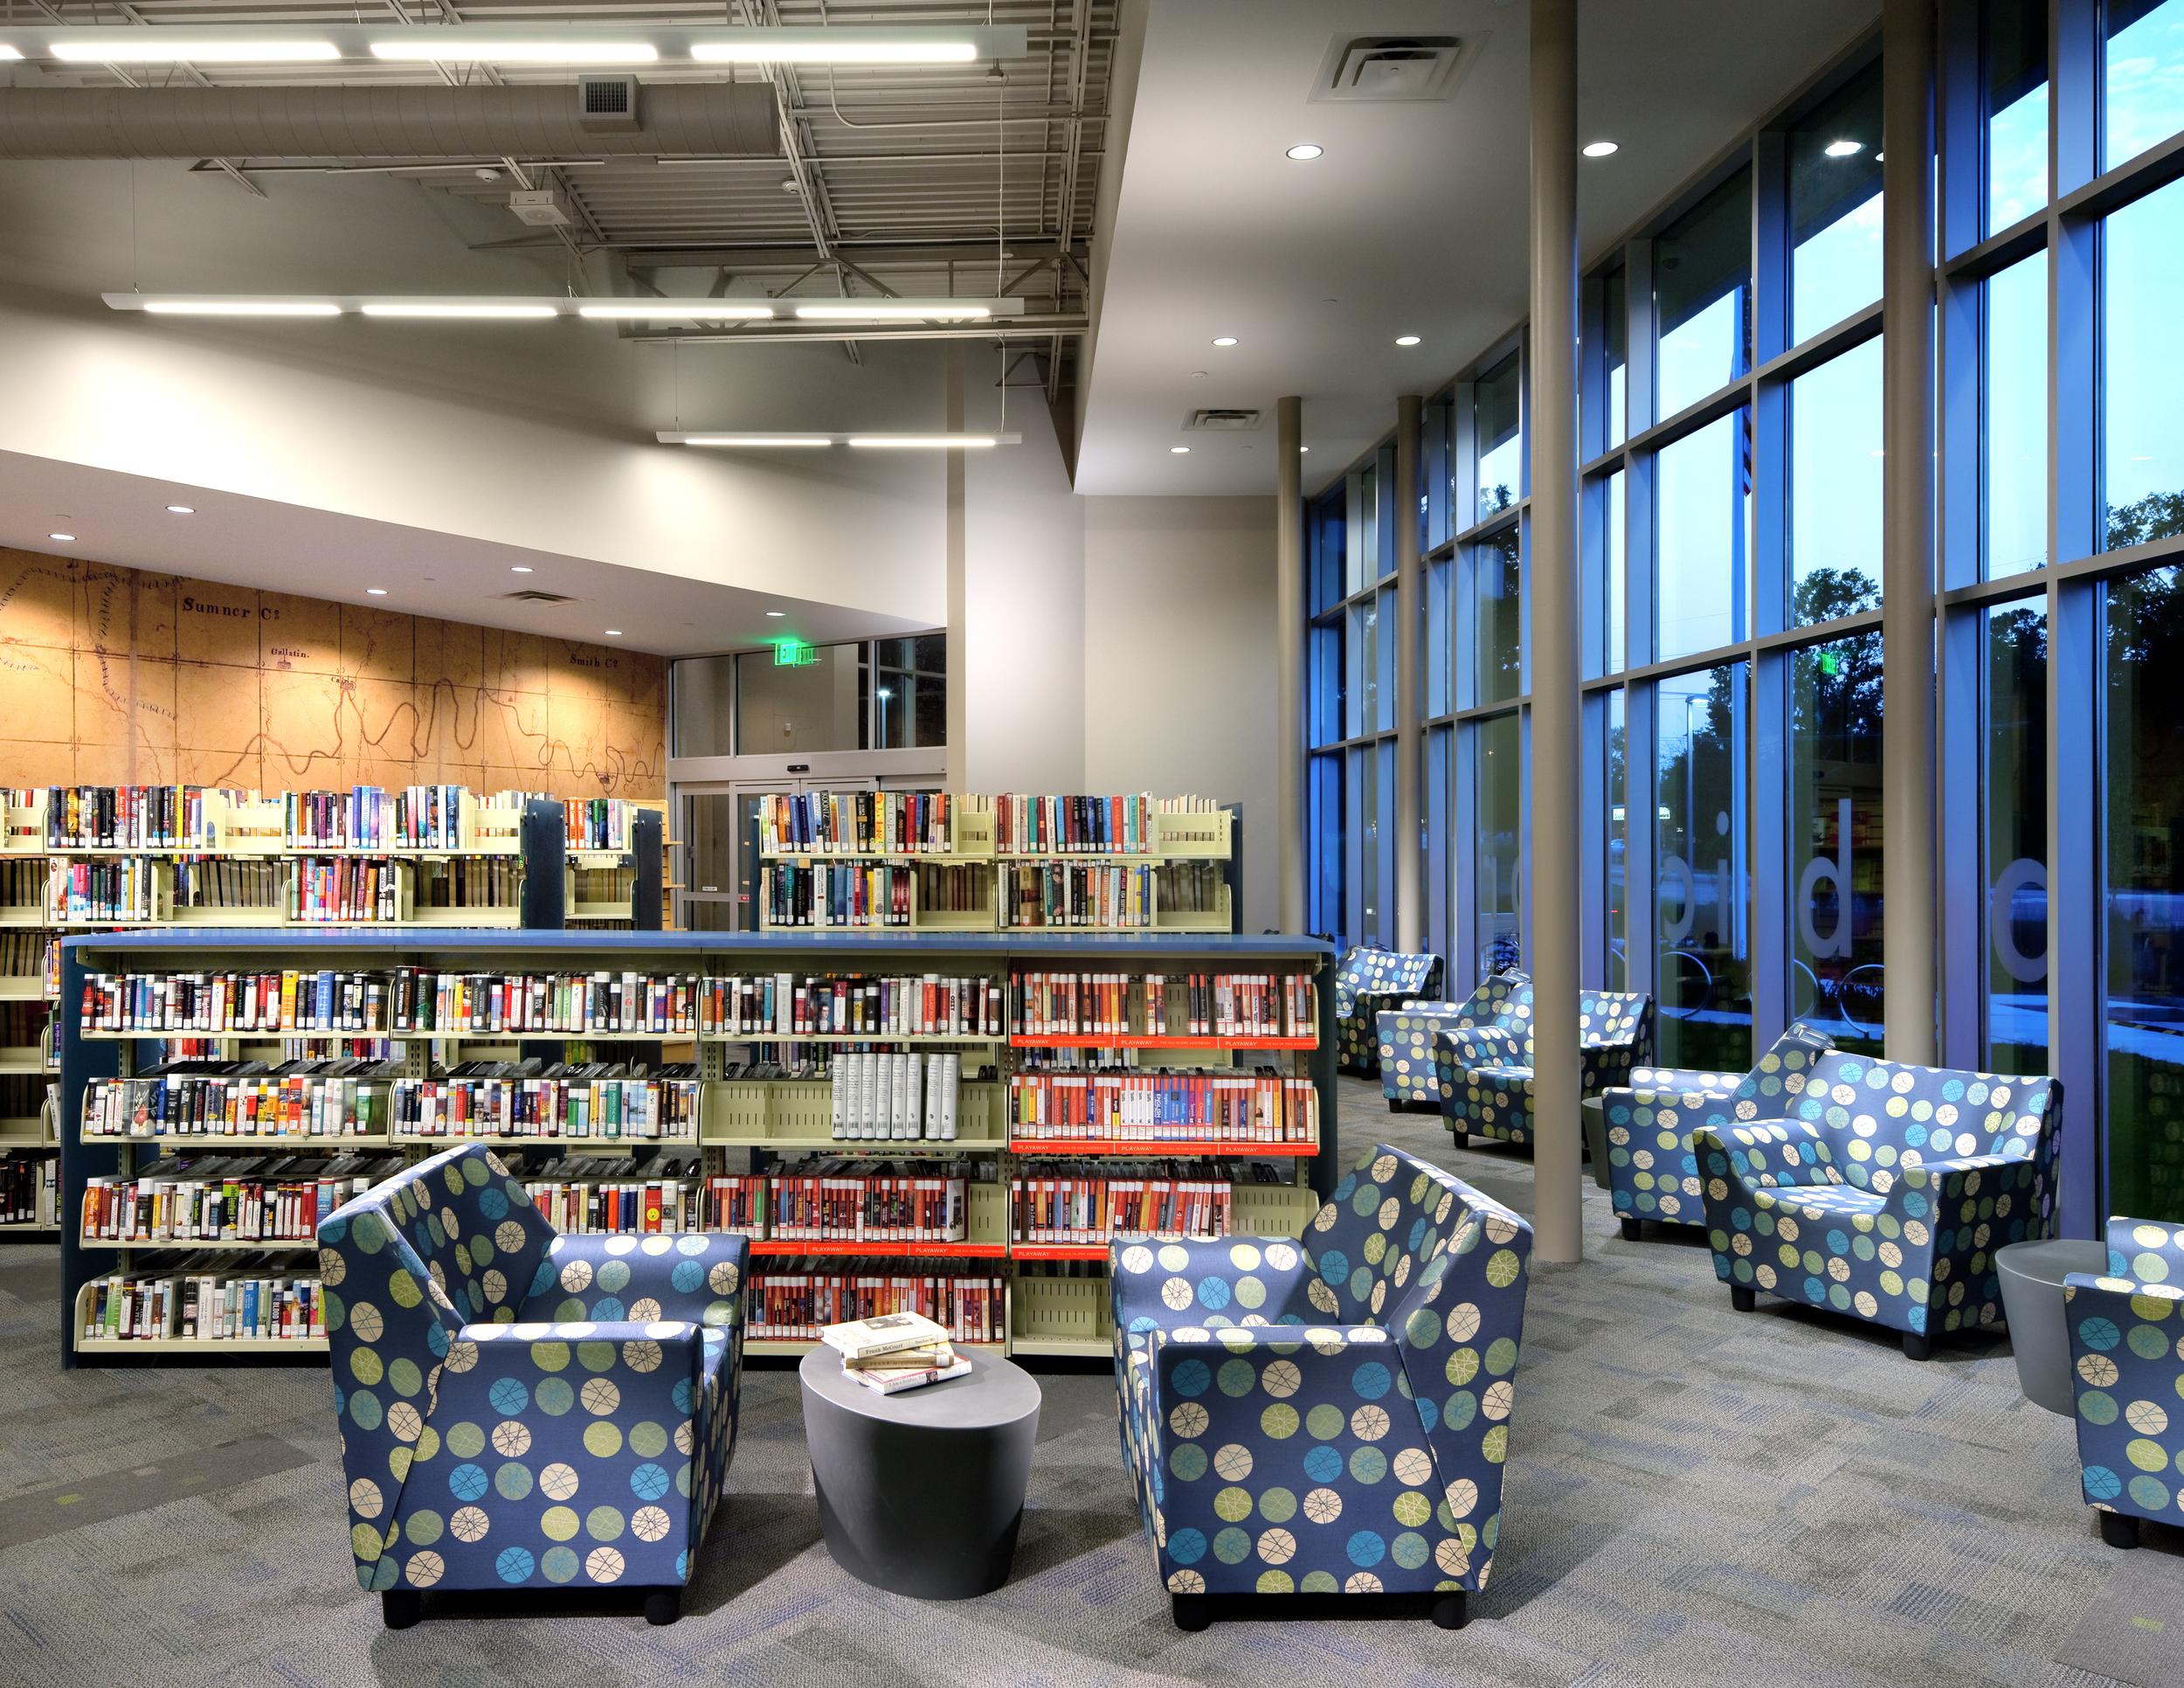 Goodlettsville Branch Library